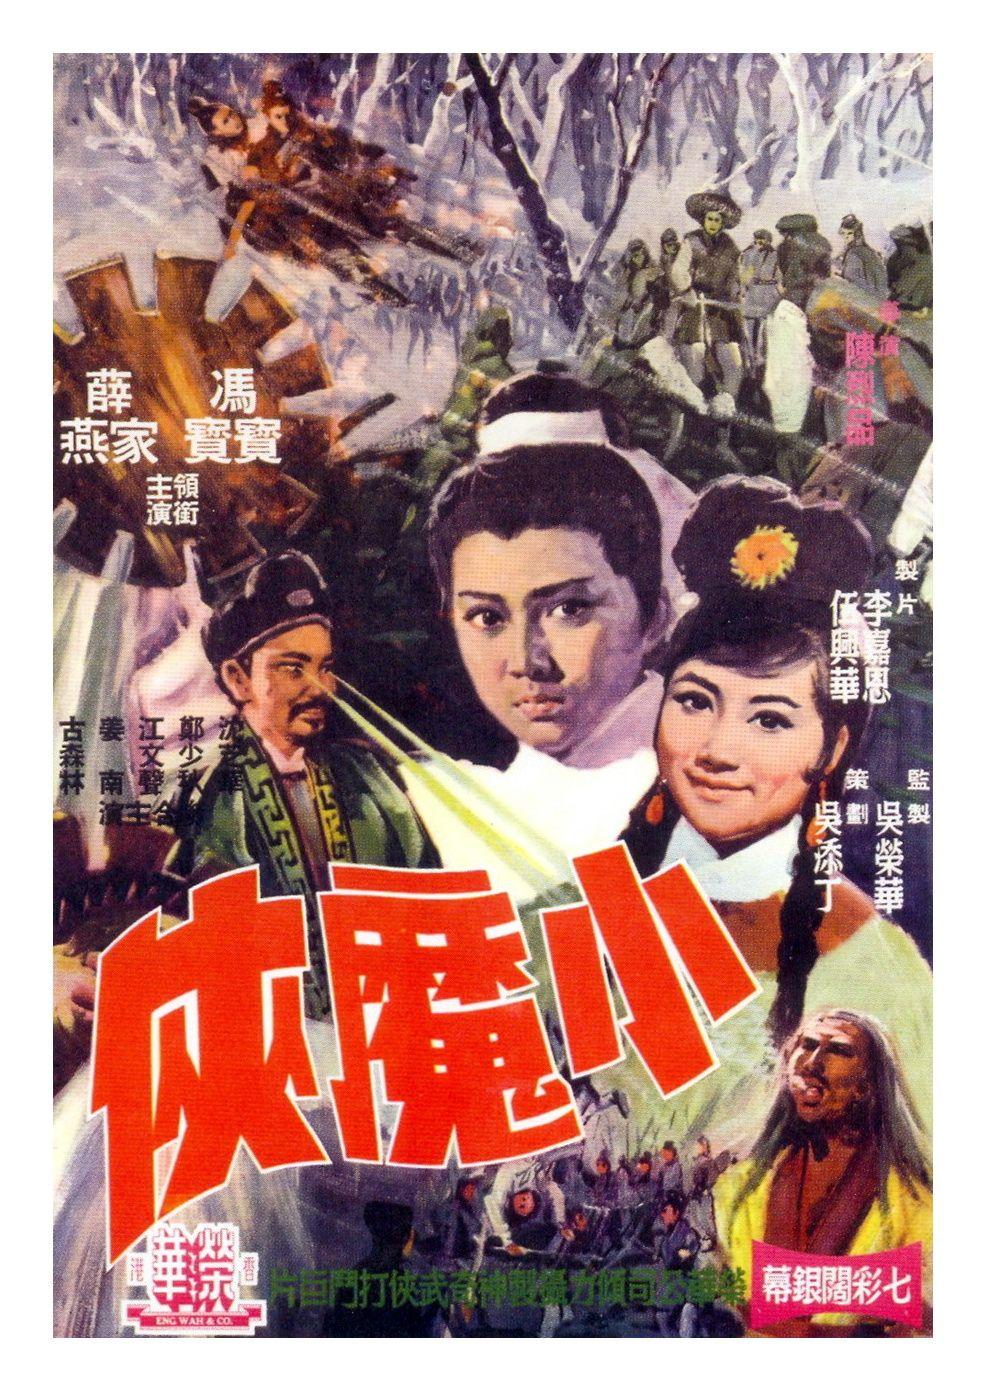 Hong Kong Movie Poster The Little Devil Aka Warrior Director Chan Lit Bun Starring Fung Bo Nancy Sit Adam Cheng 1969